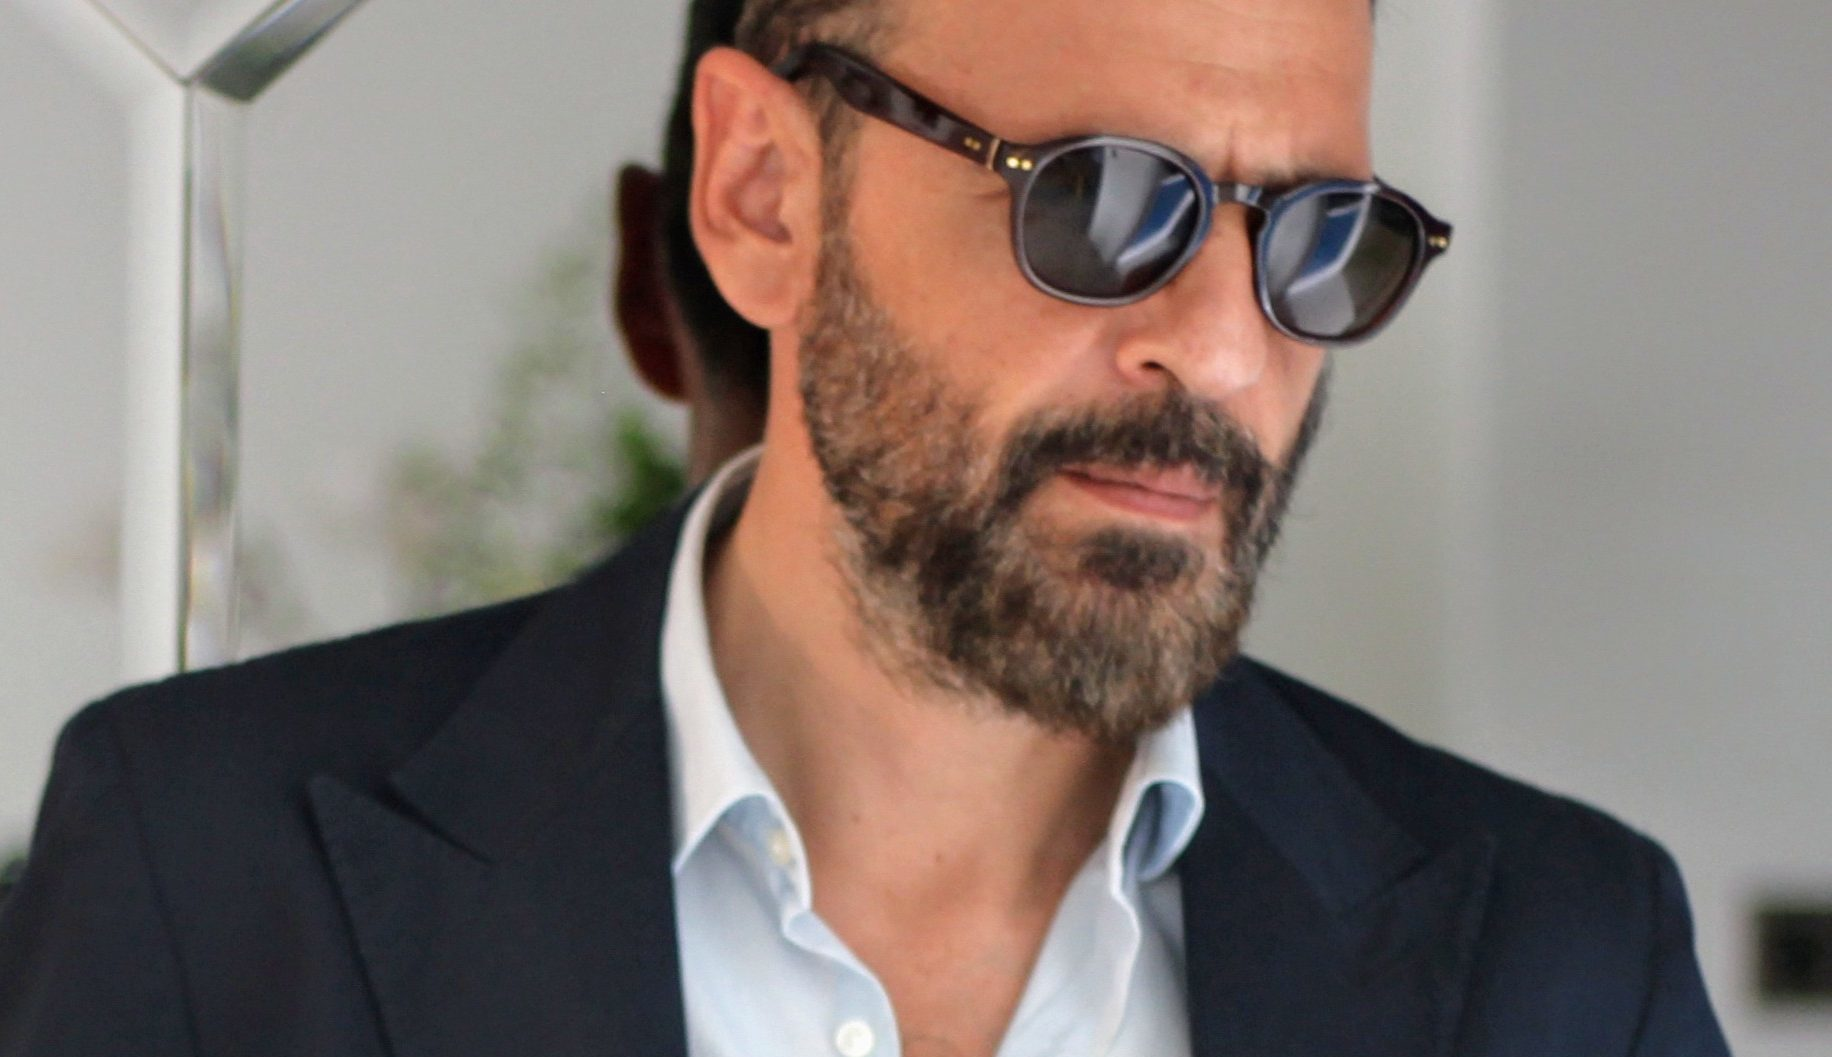 Christopher Senekki